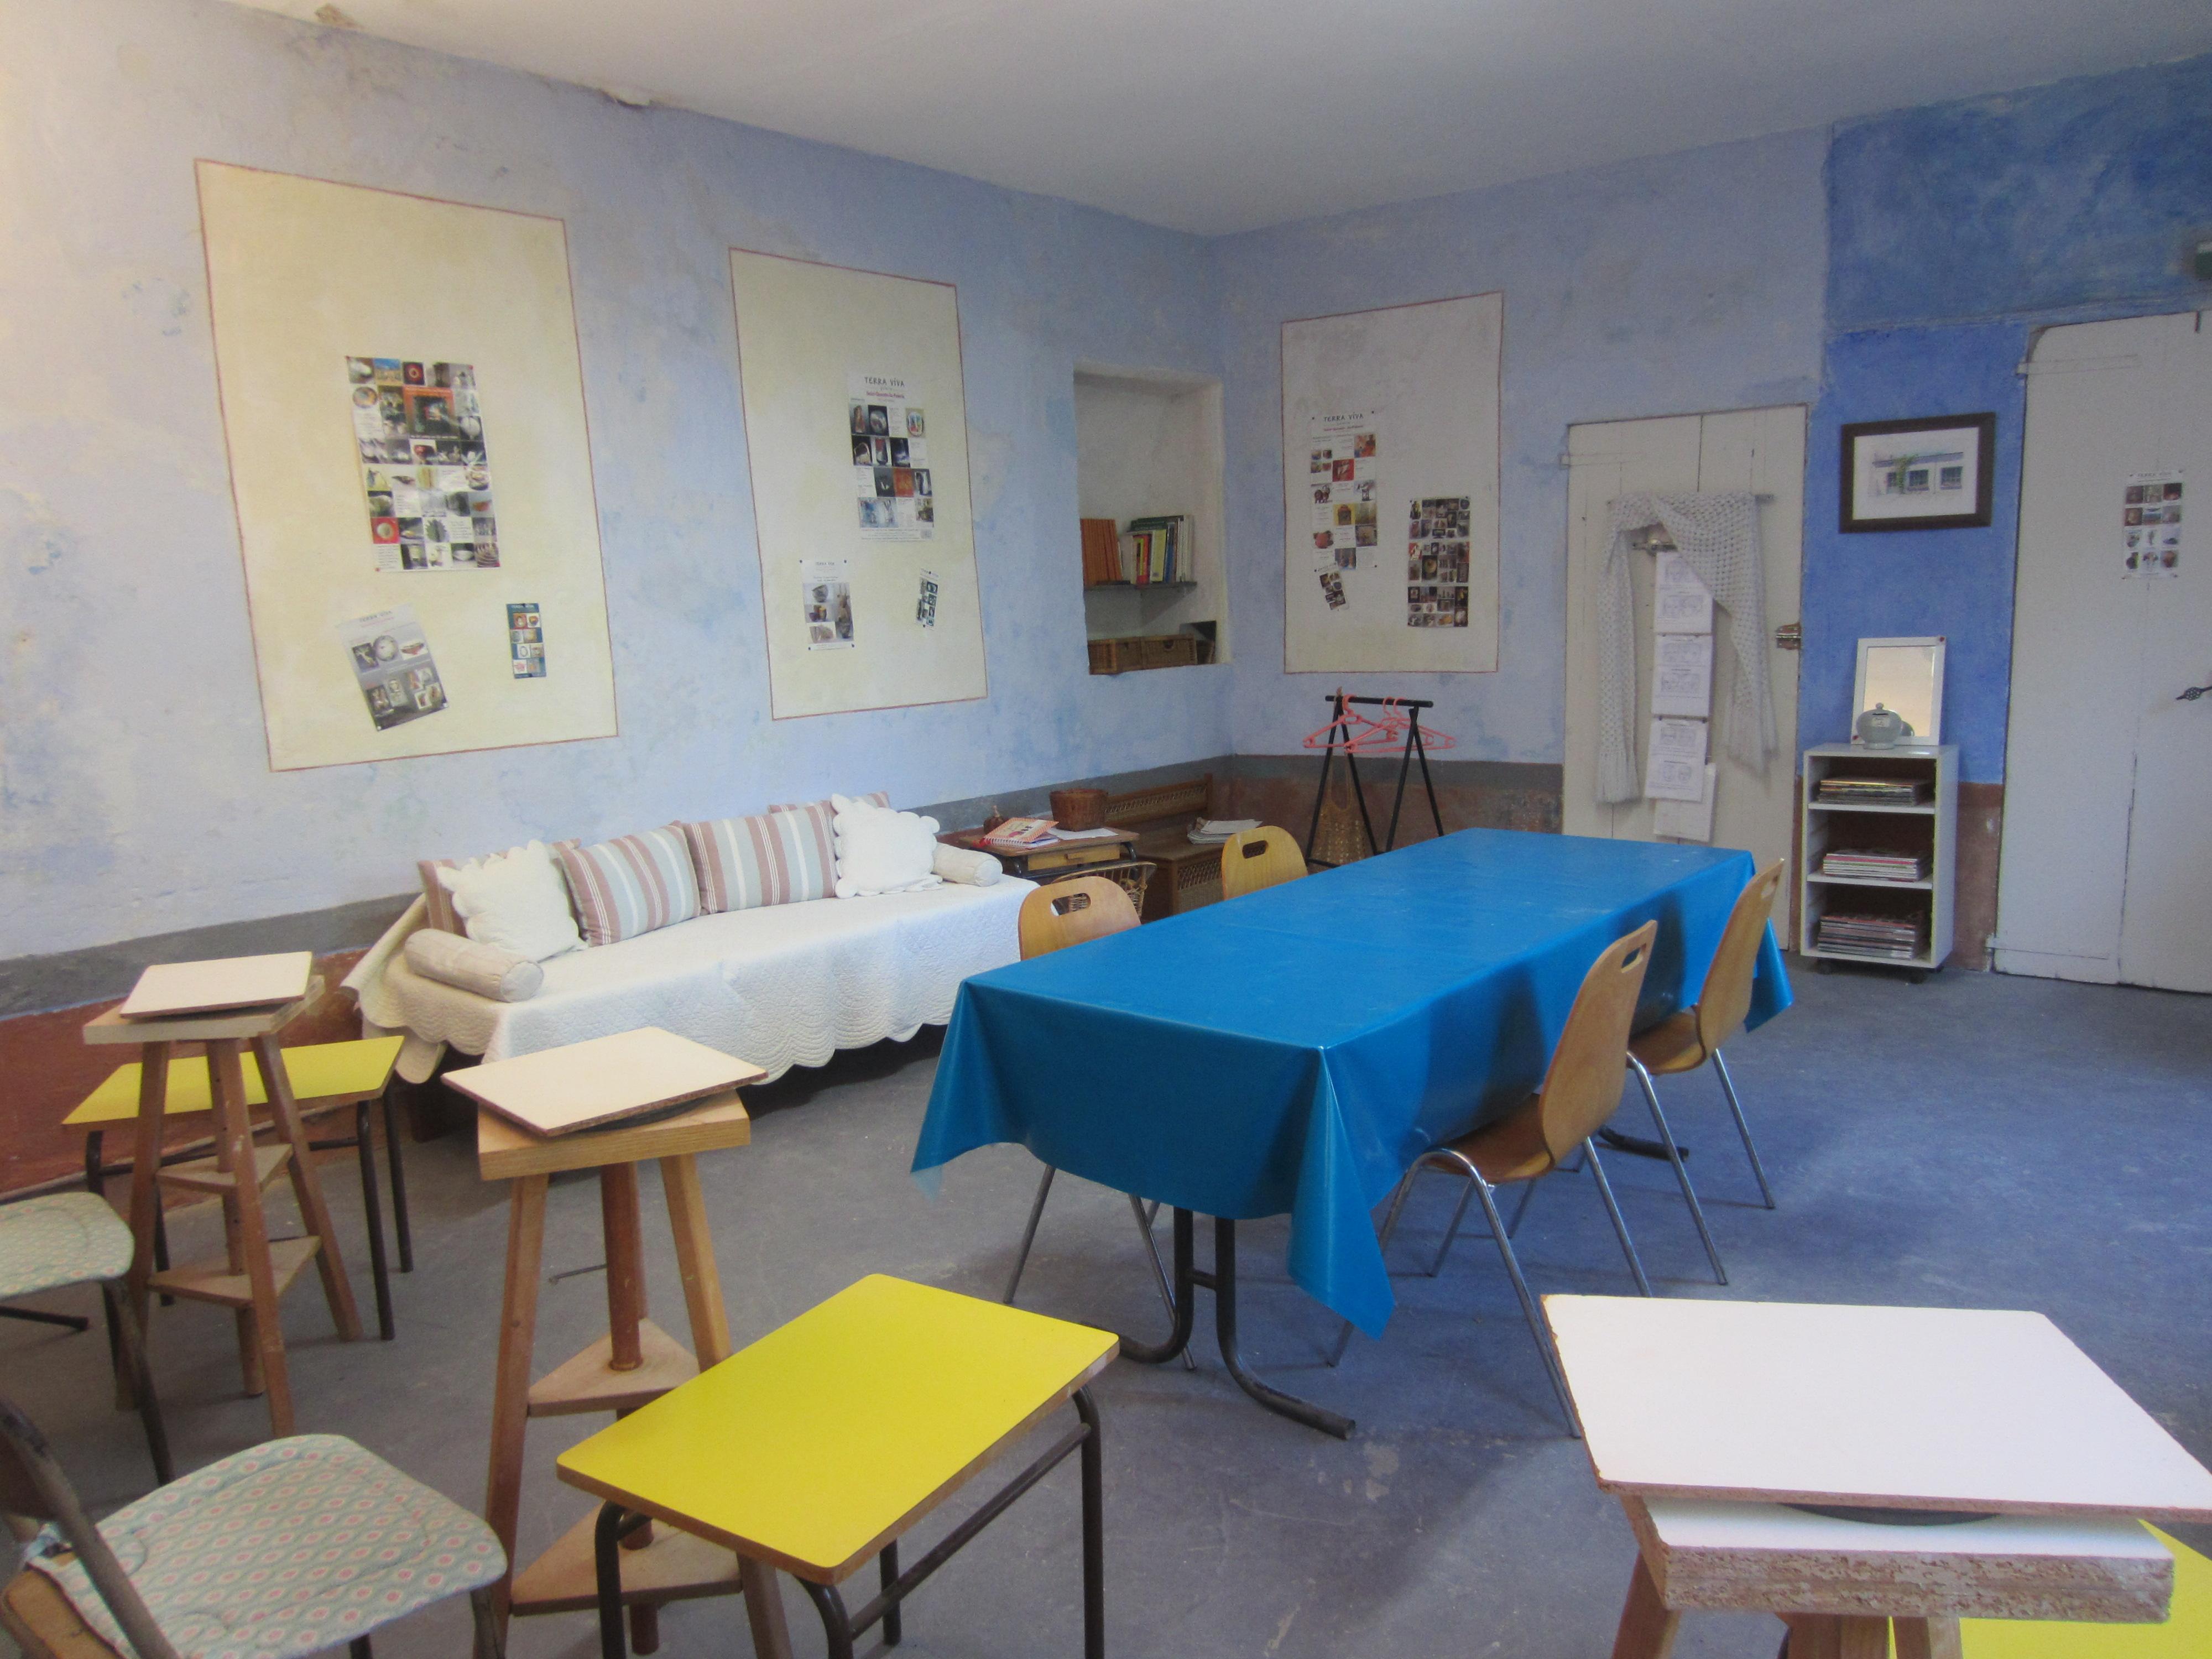 Atelier bleu